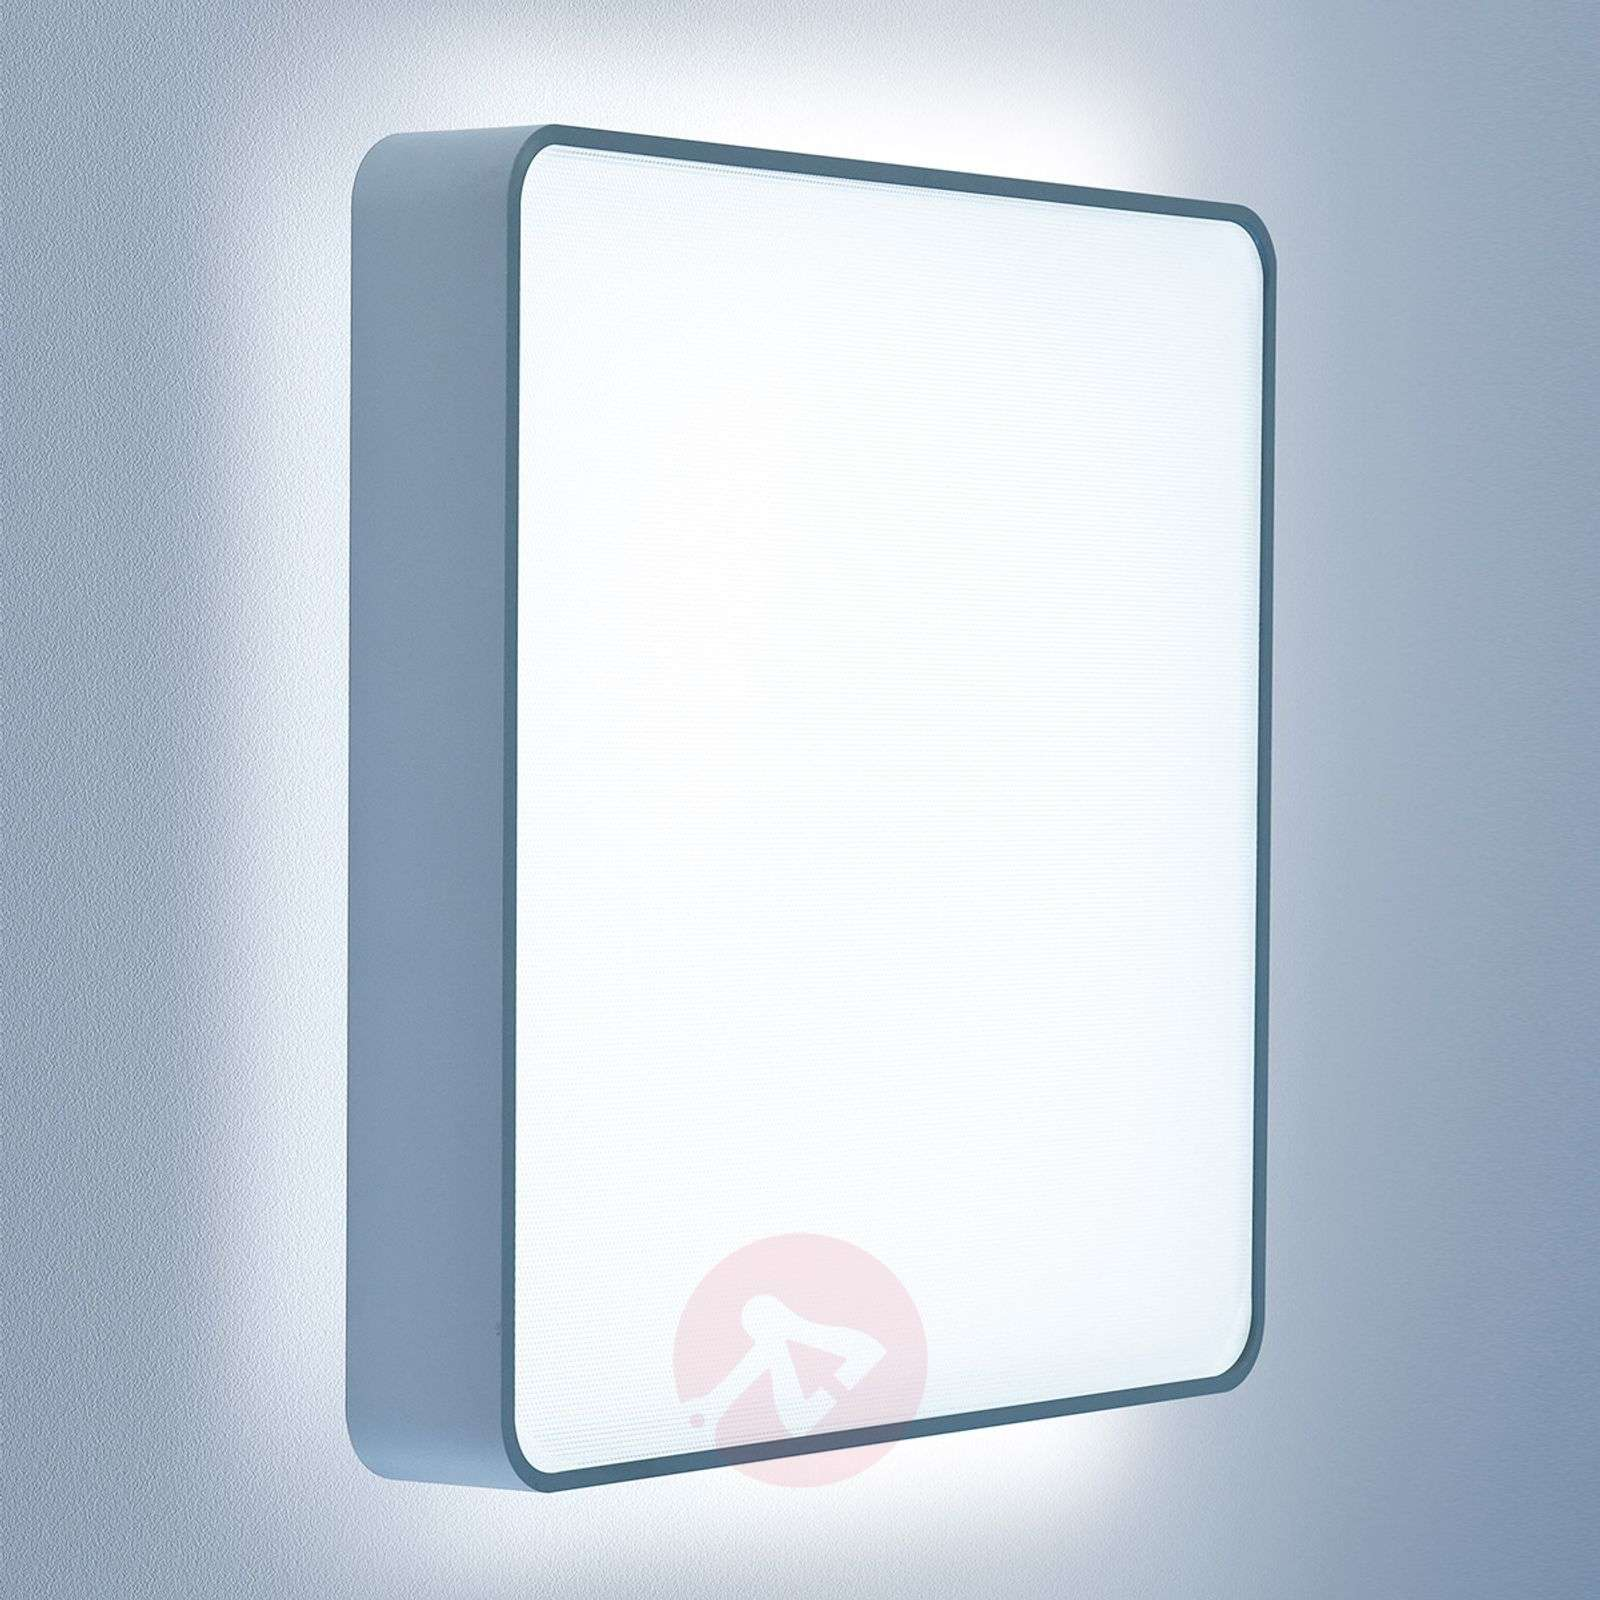 Caleo X2 square LED wall light-6033424X-02